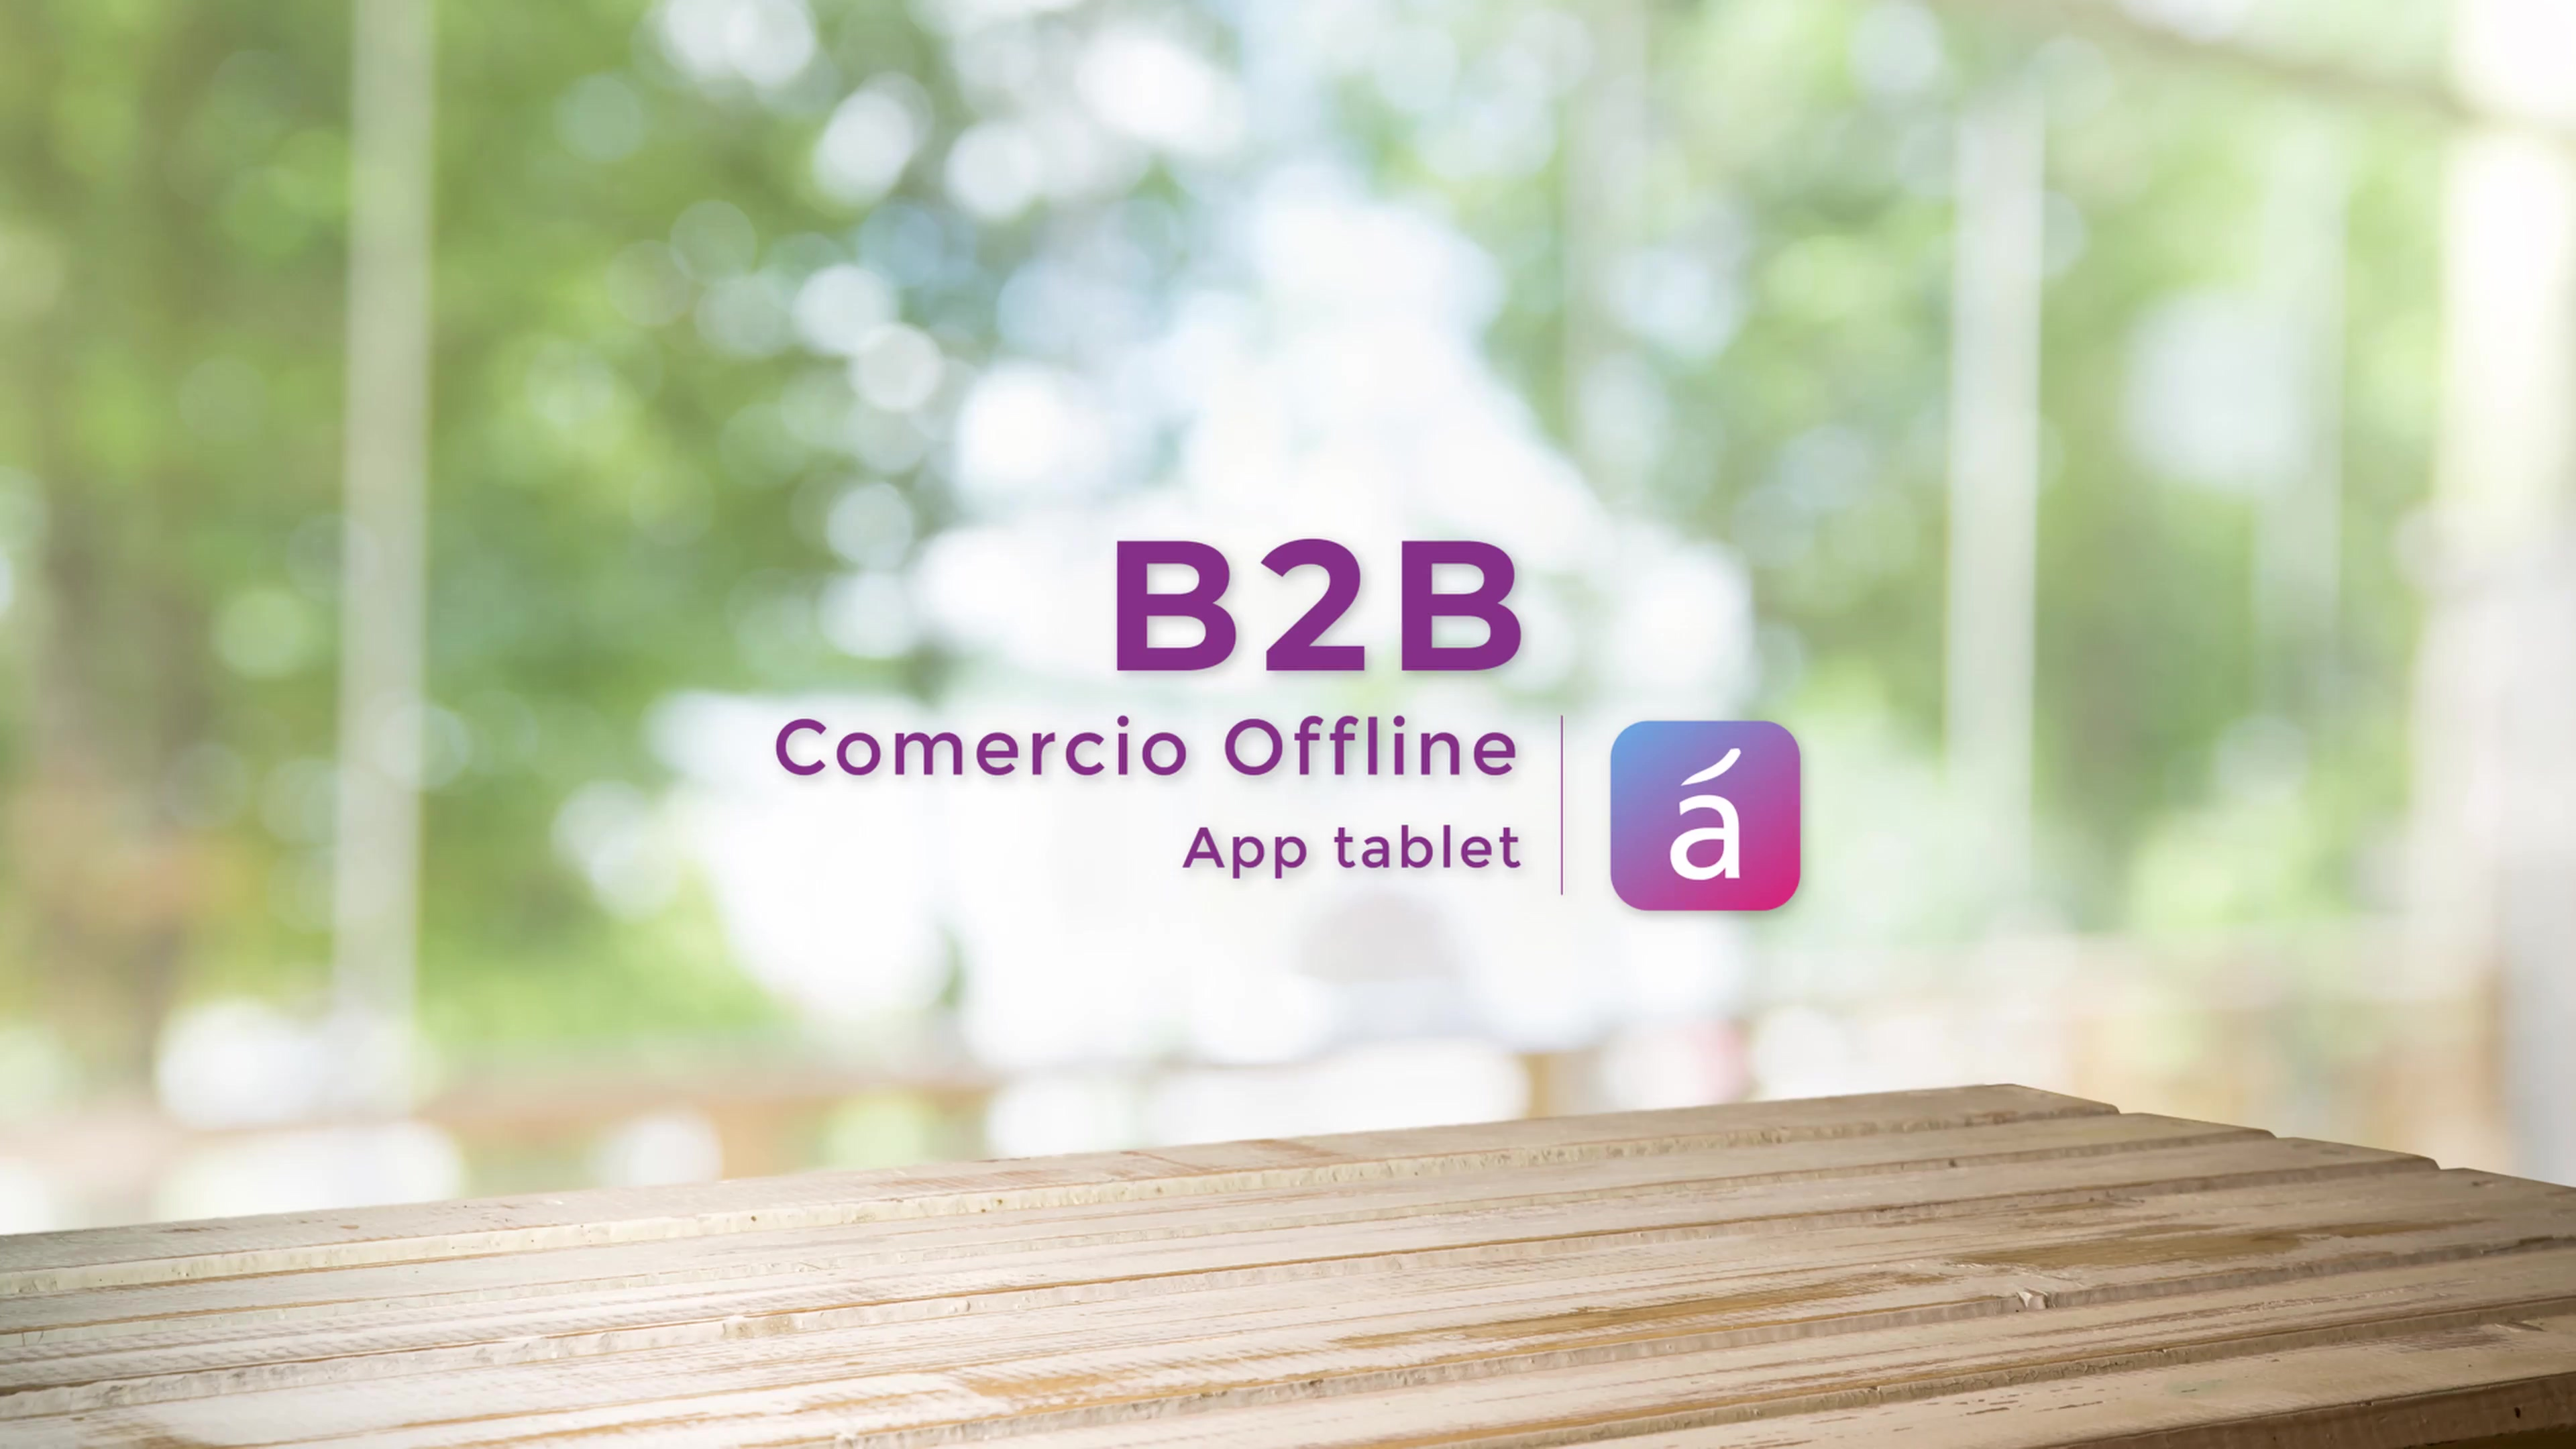 B2B Comercio Offline App tablet_10092020